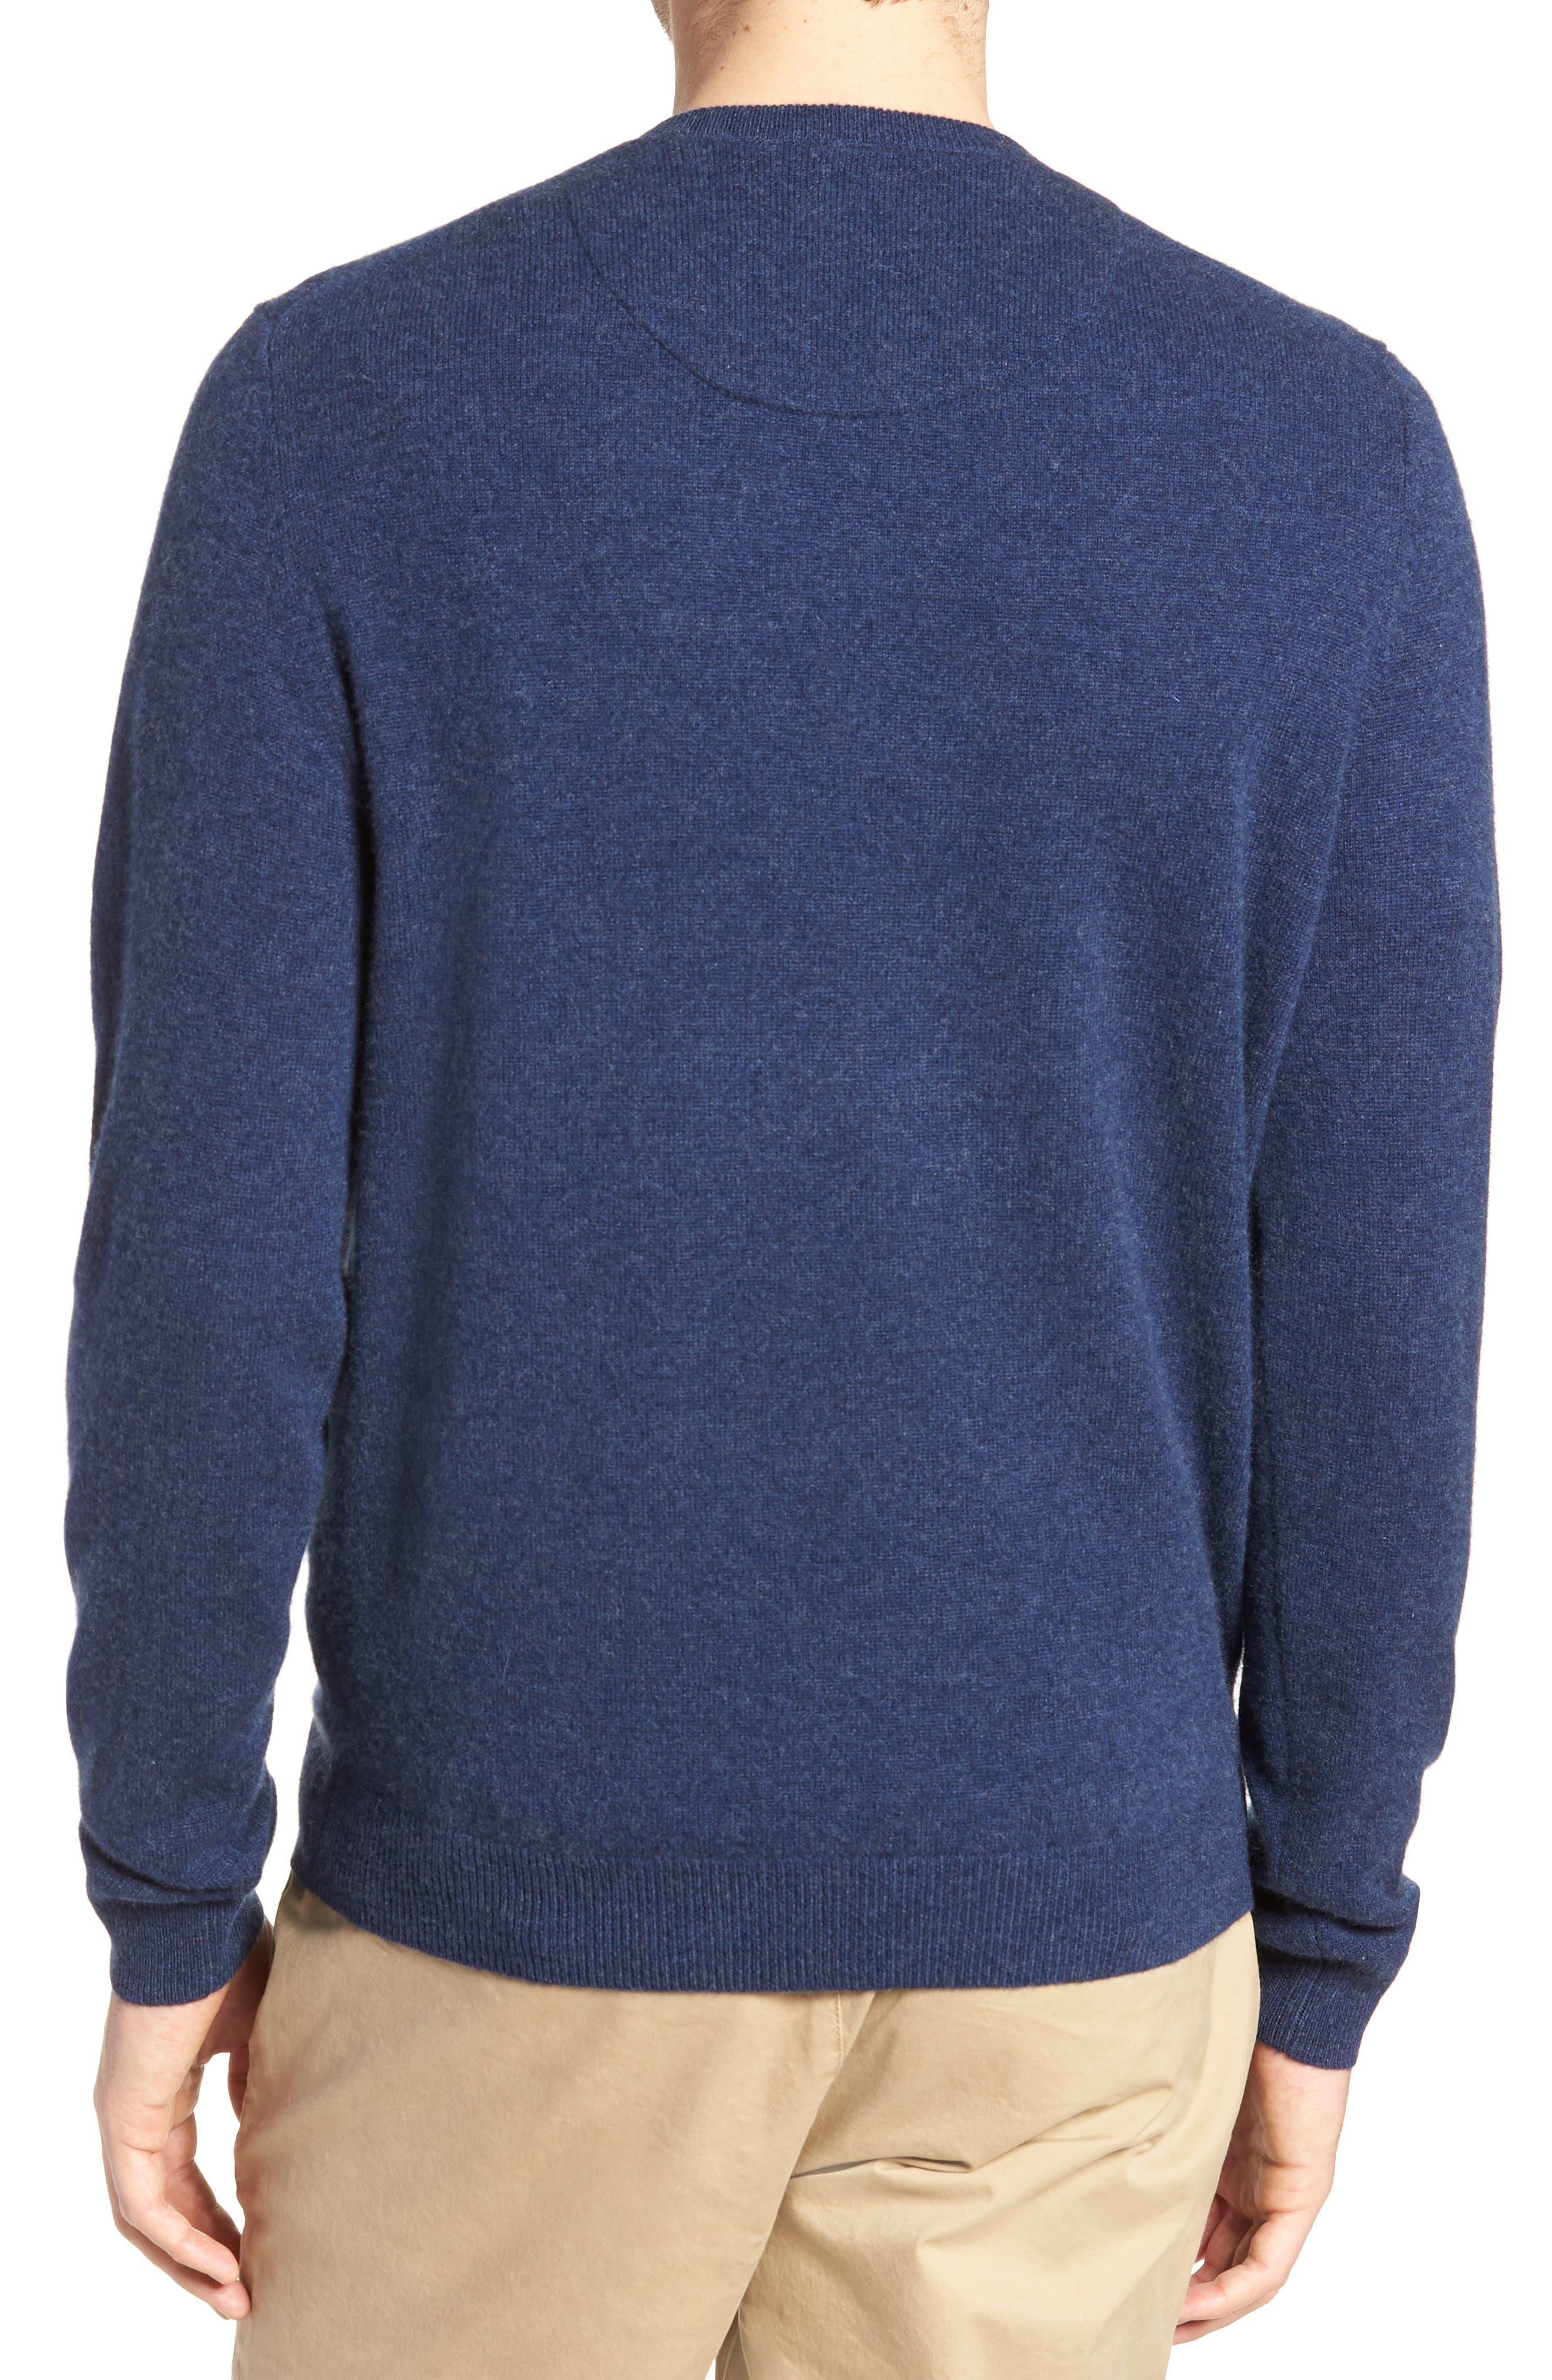 Cashmere V-Neck Sweater,                             Alternate thumbnail 2, color,                             BLUE ESTATE HEATHER